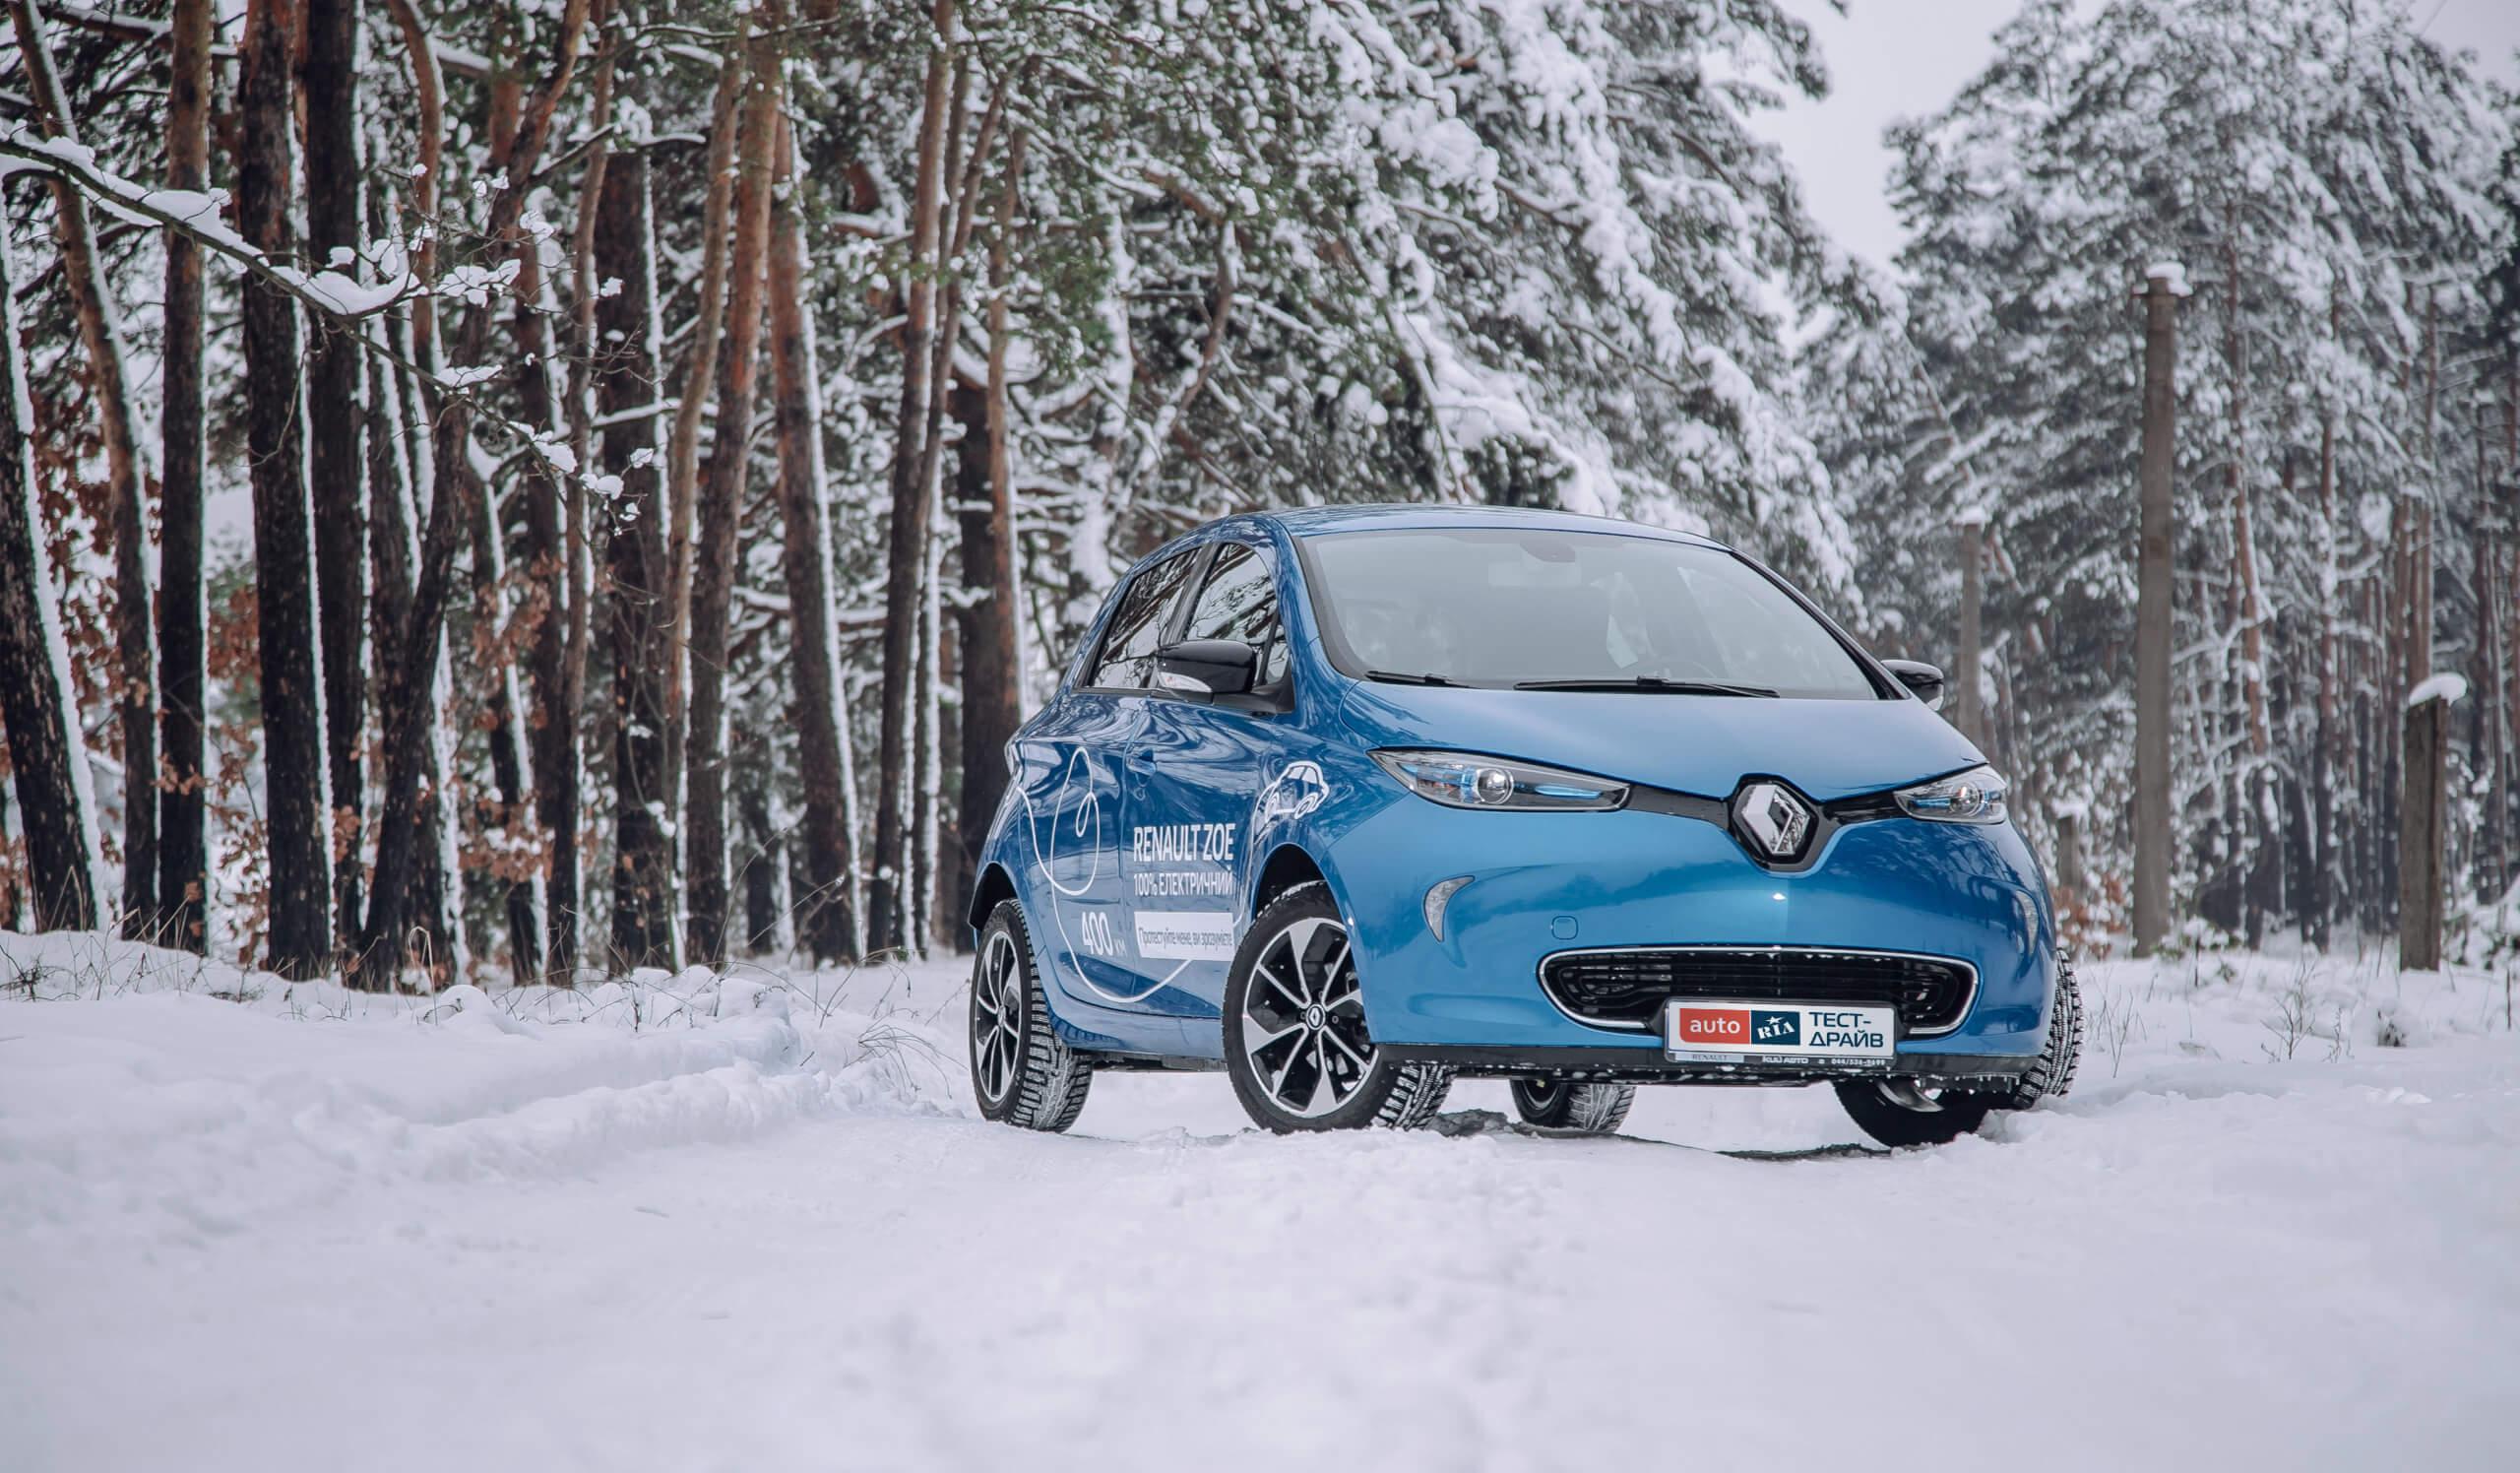 Renault ZOE: Зоя и генерал Мороз, cтраница 3